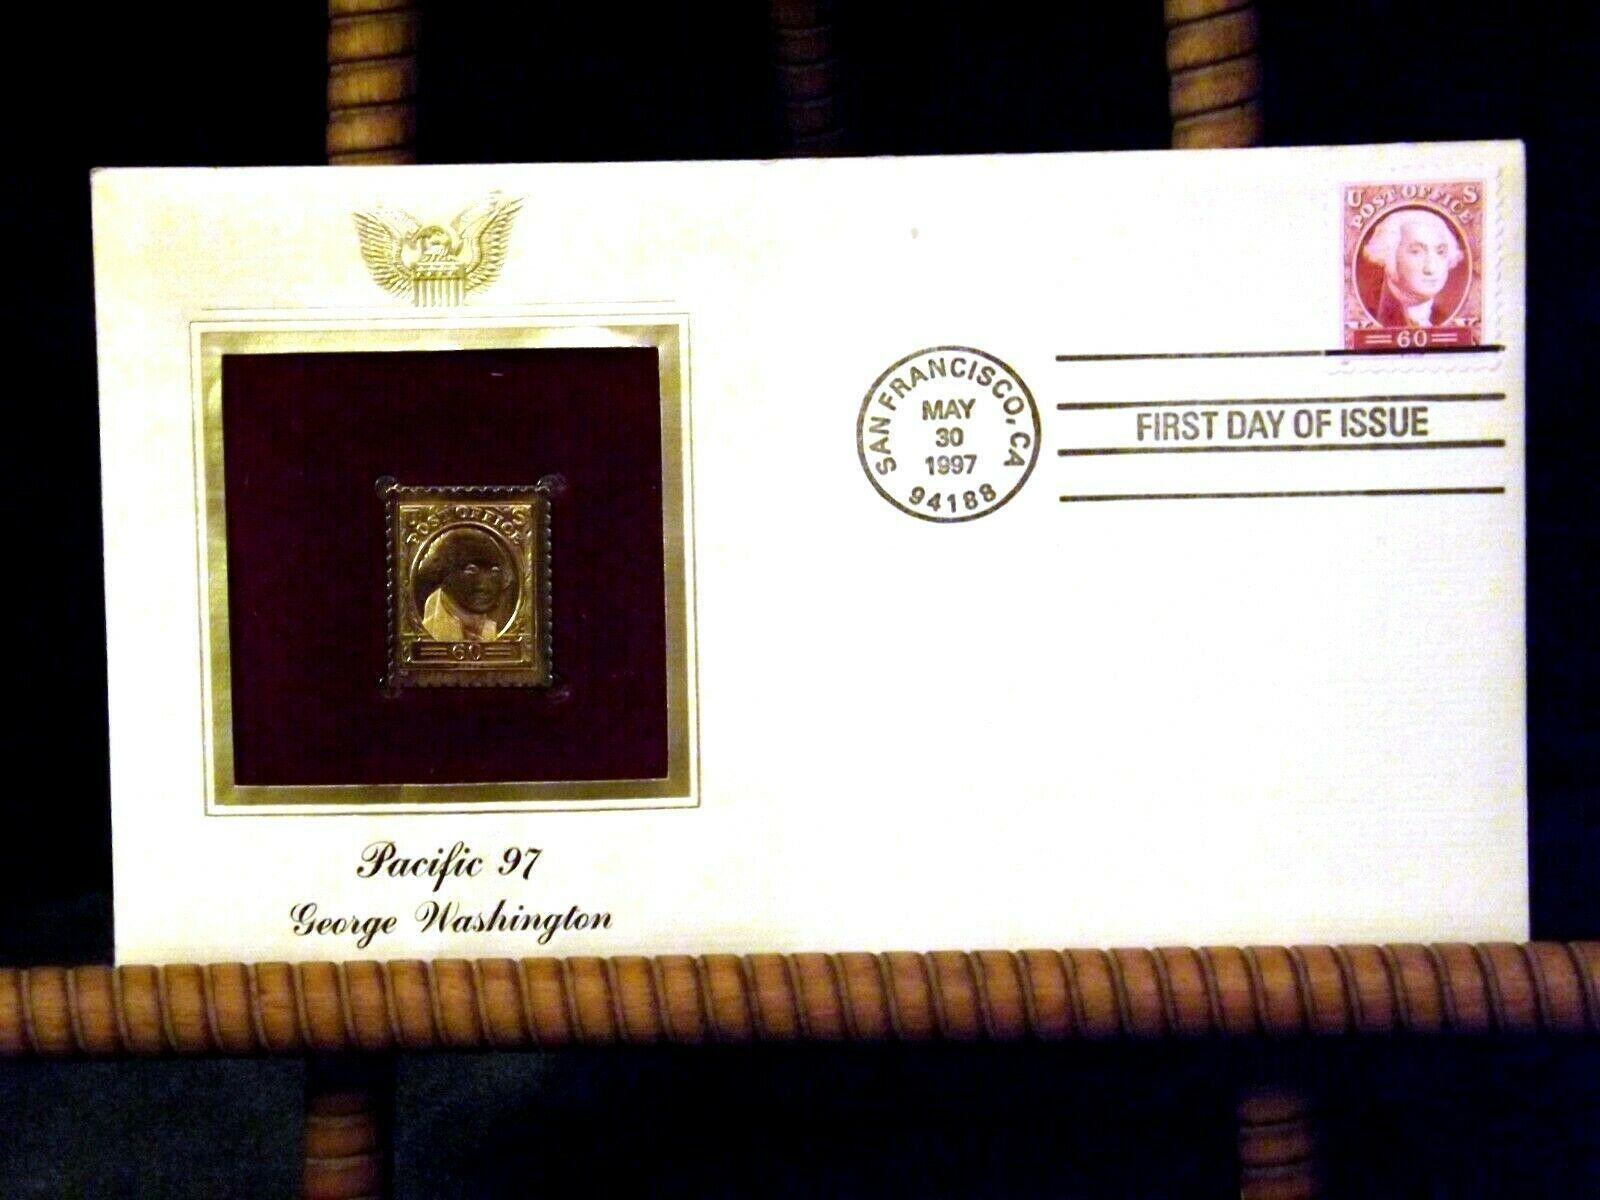 Pacific 97 George Washington Stamp 1997 AA19-ST6024